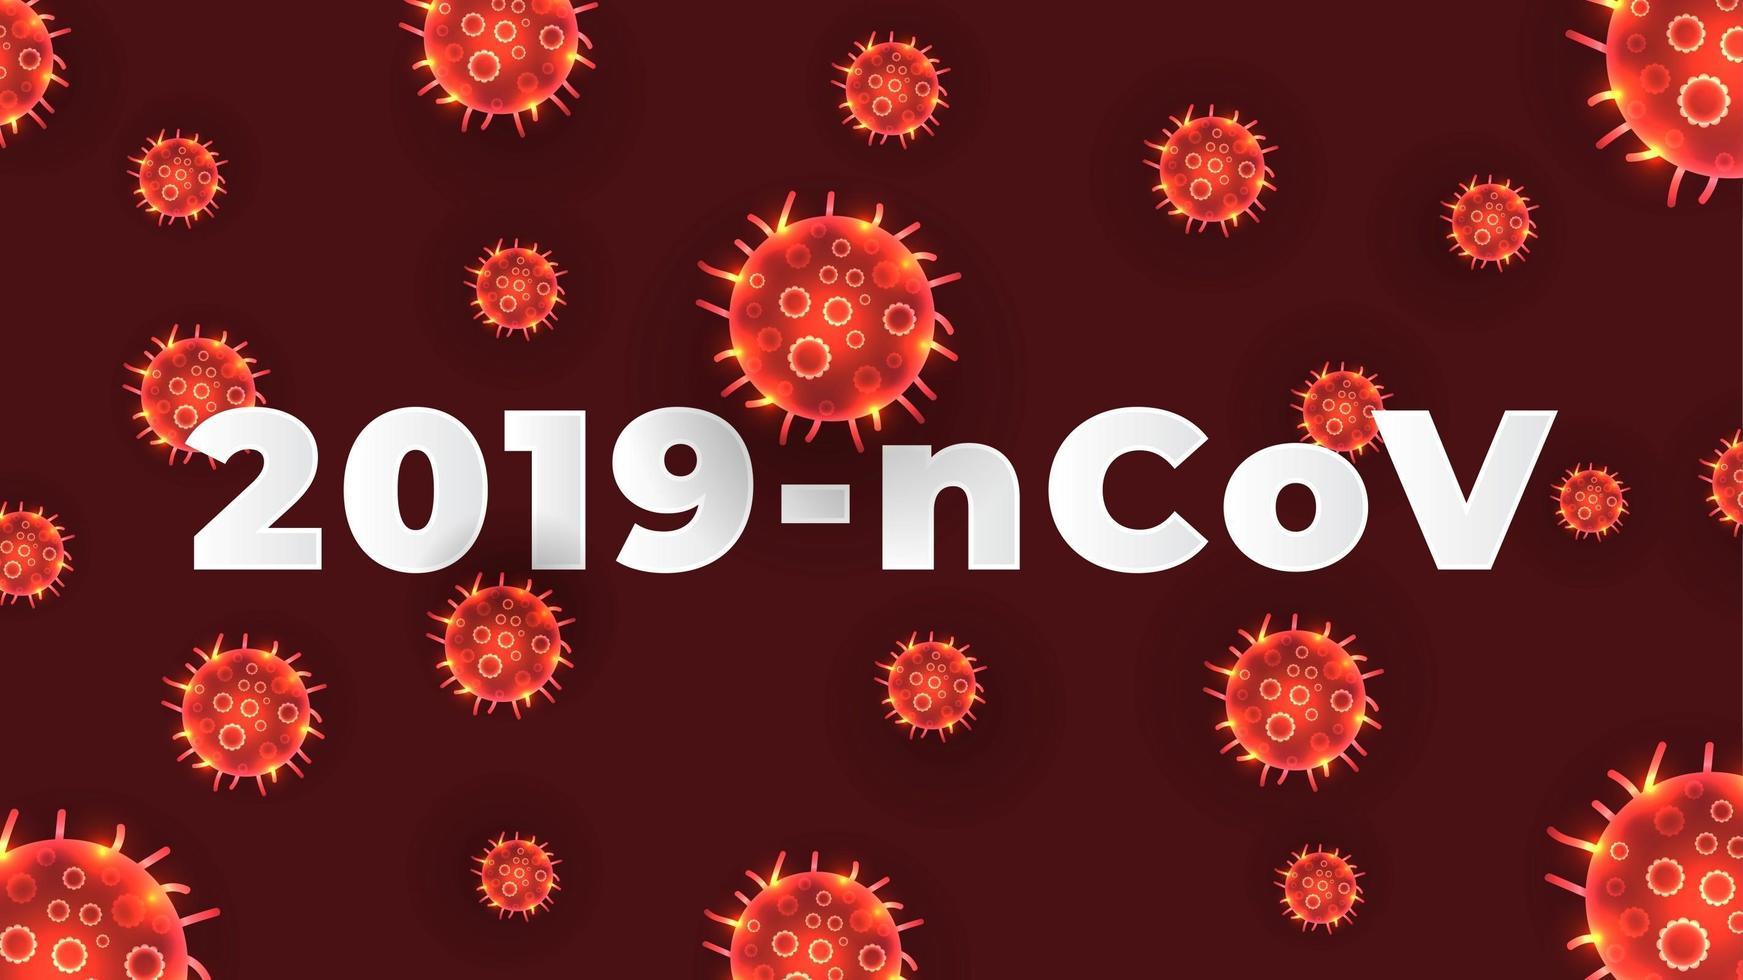 rode coronavirus covid-19 achtergrond vector